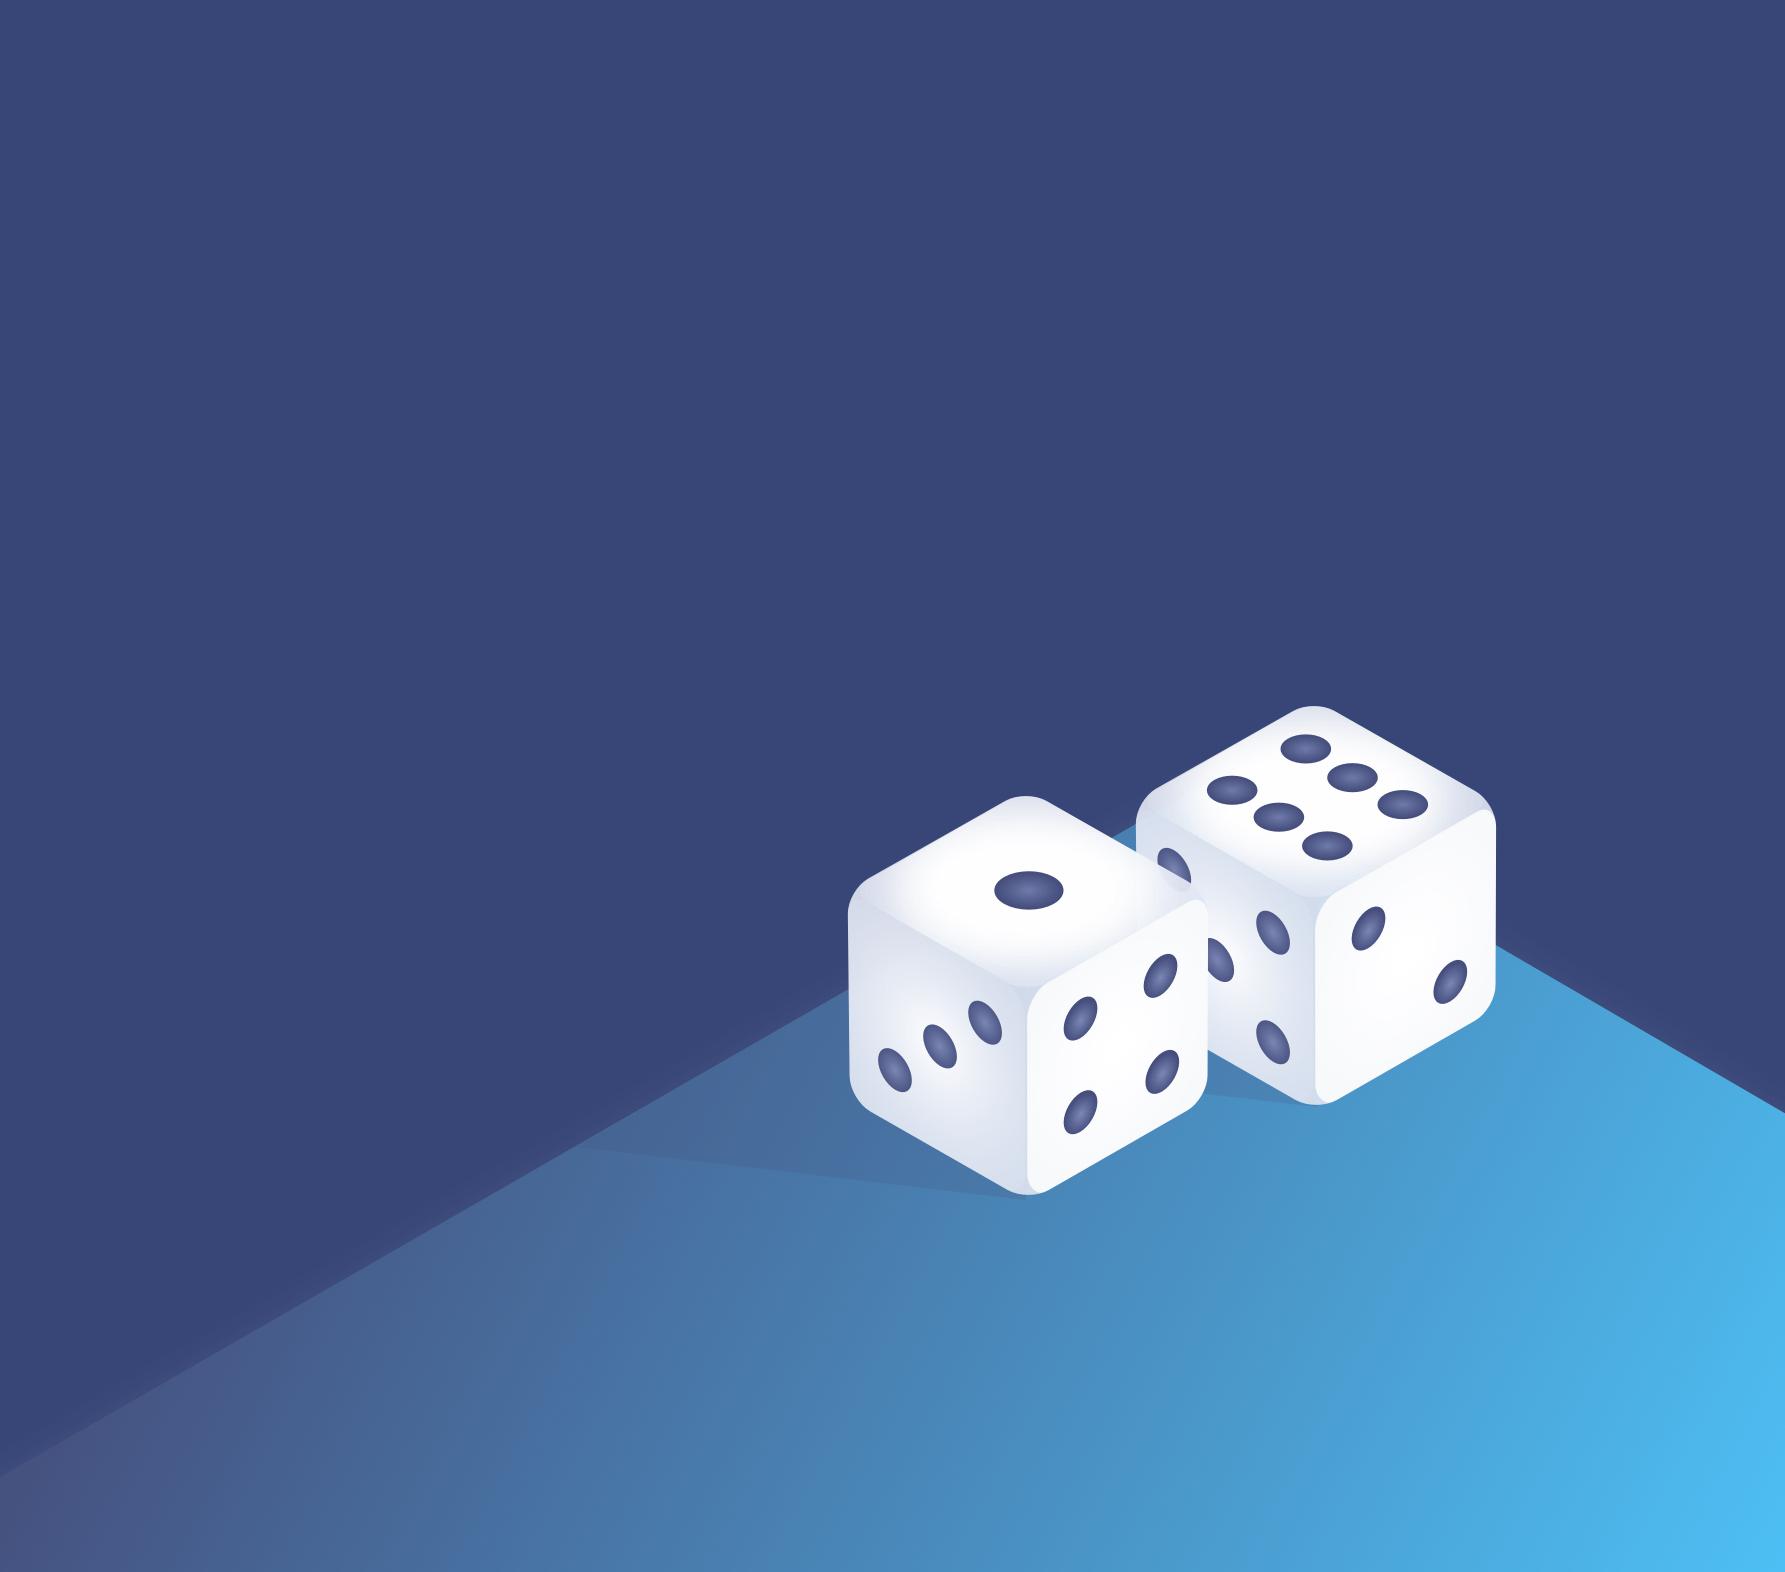 betterteams_dice_square